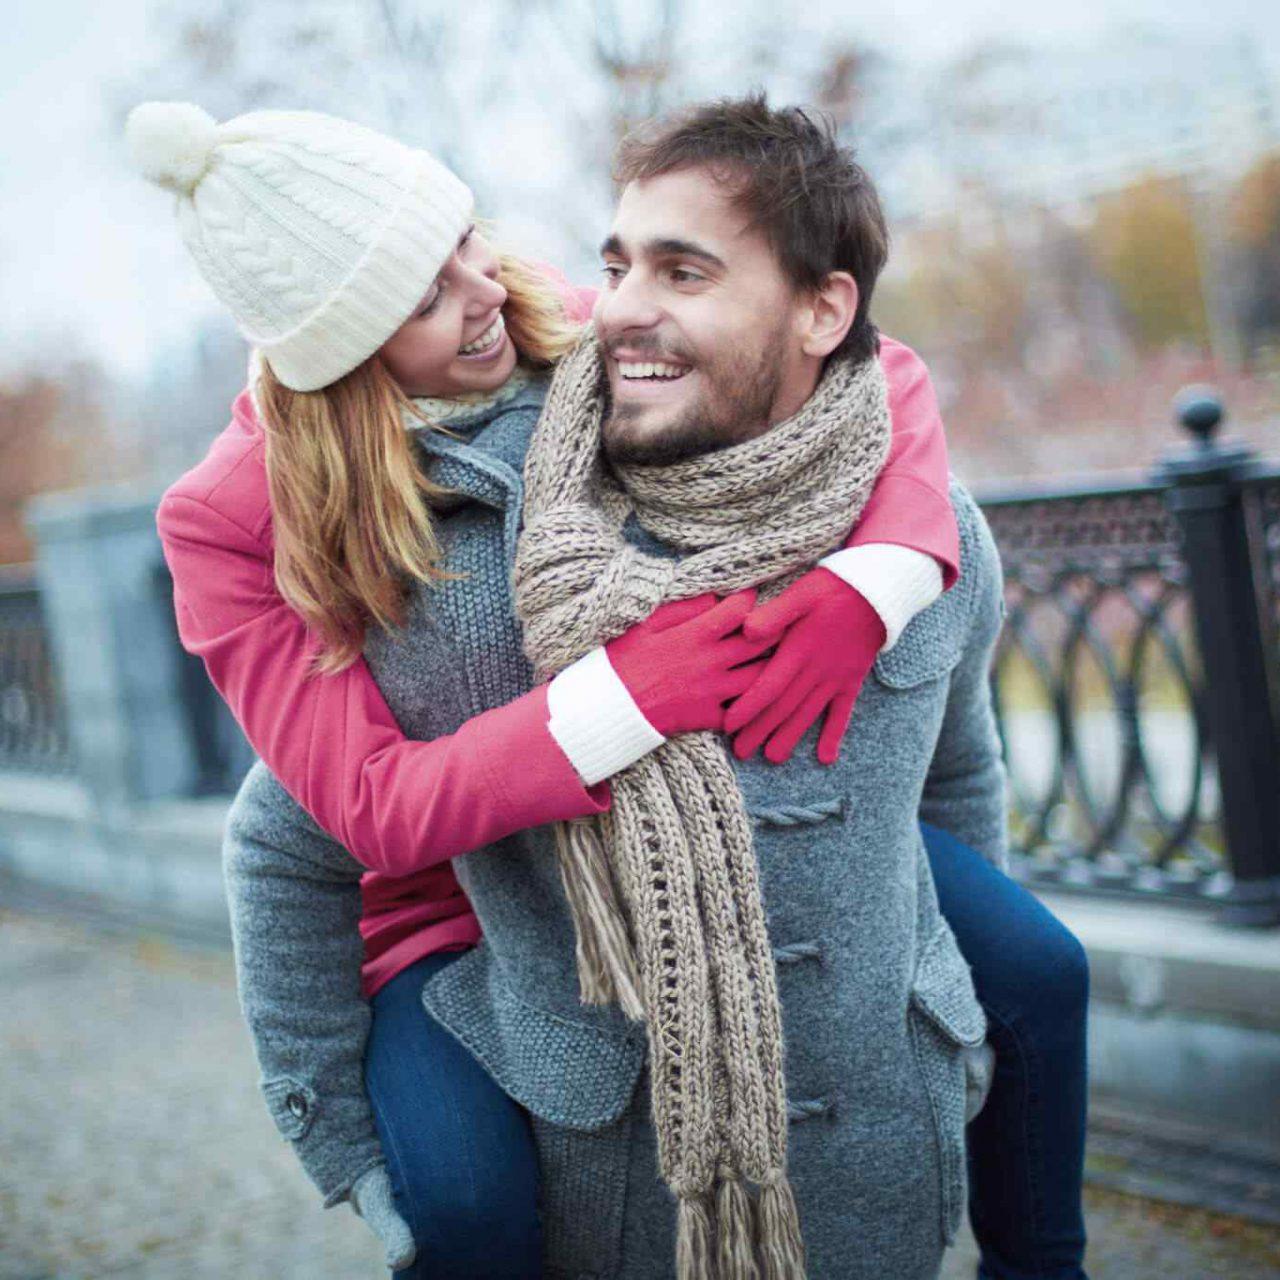 https://www.prepared.sarl/wp-content/uploads/2018/01/img-event-marriage-01-1280x1280.jpg